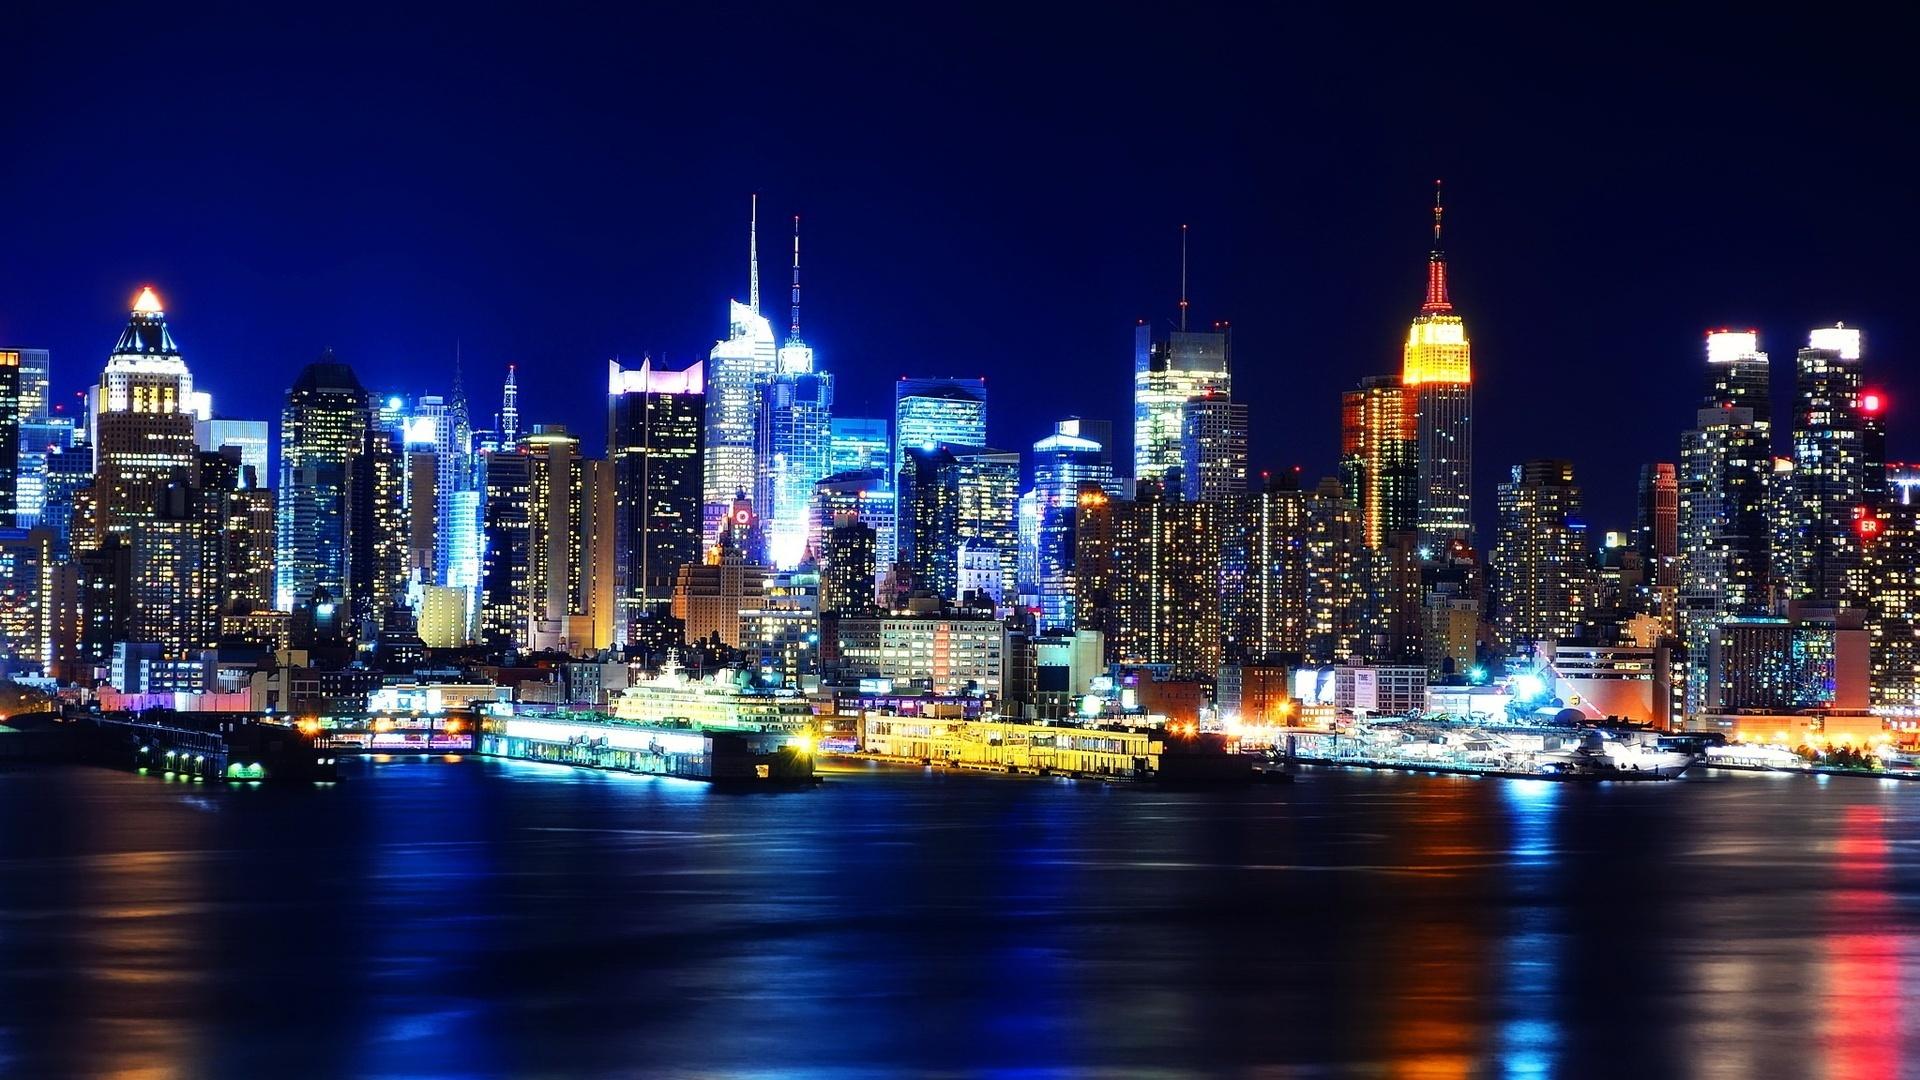 New York City at Night Wallpaper HD wallpaper background 1920x1080